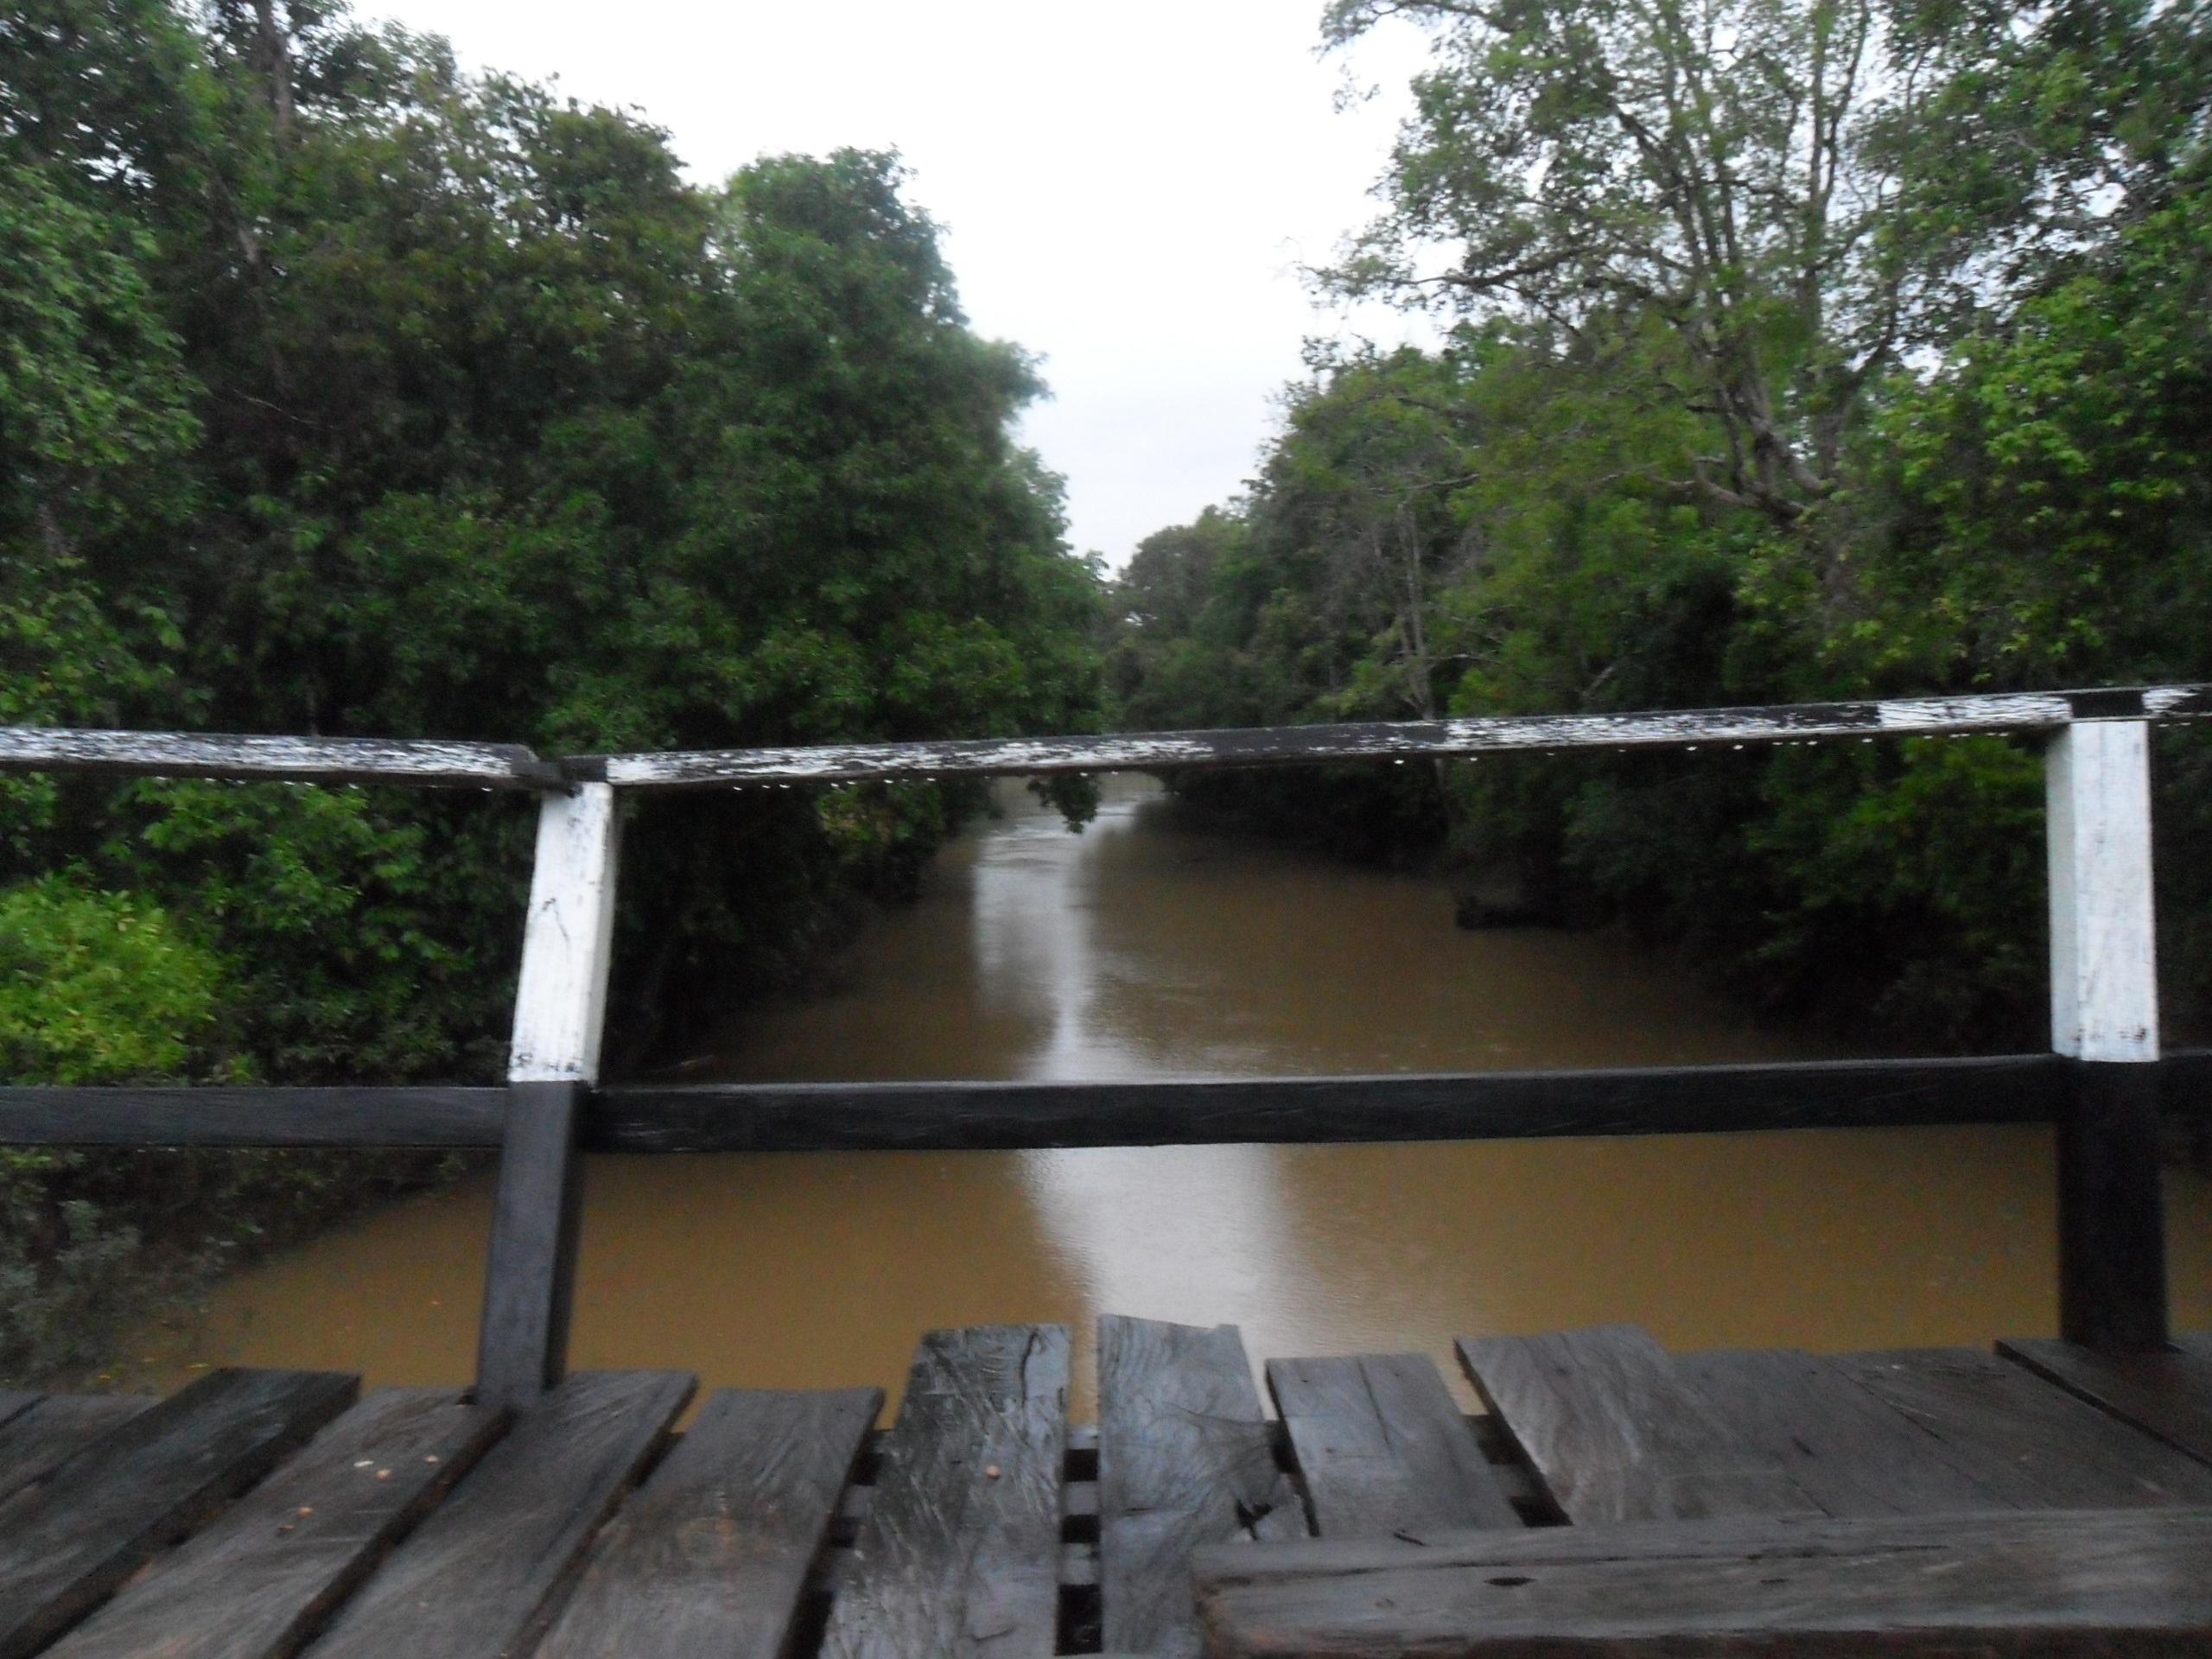 Cross the river, Bridge, Forest, River, Wood, HQ Photo